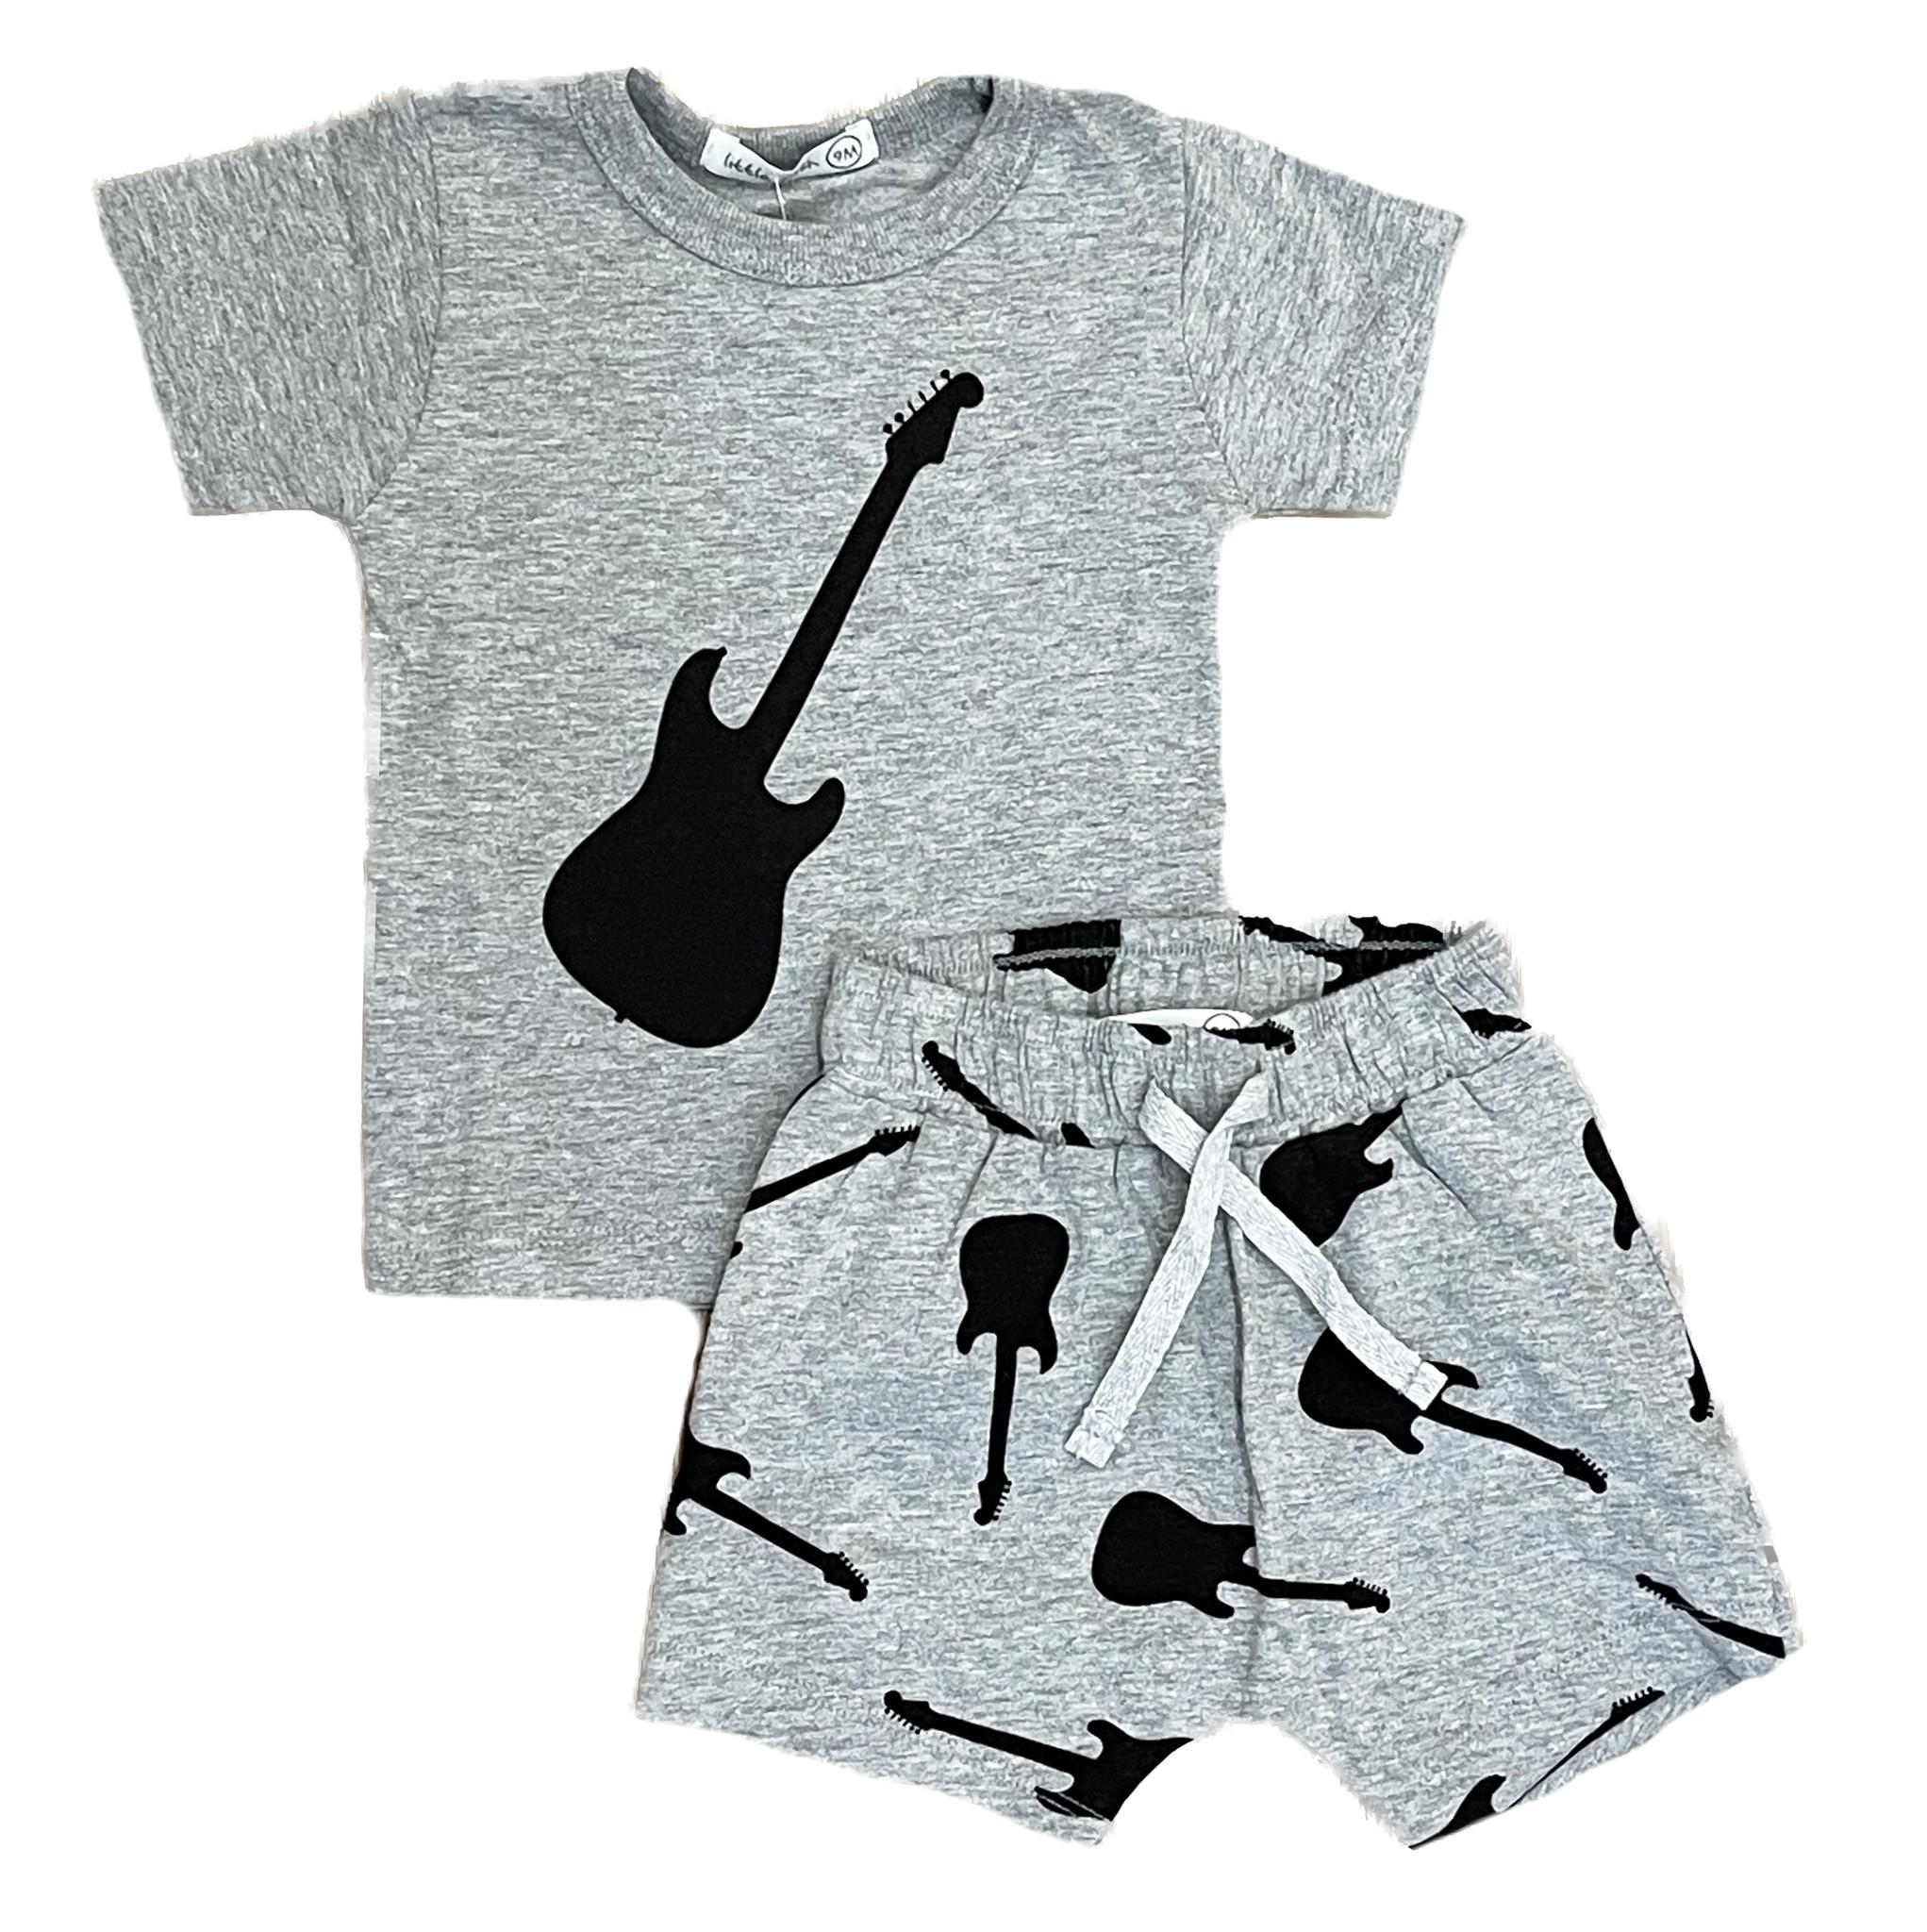 Little Mish Grey/Black Guitars Short Set